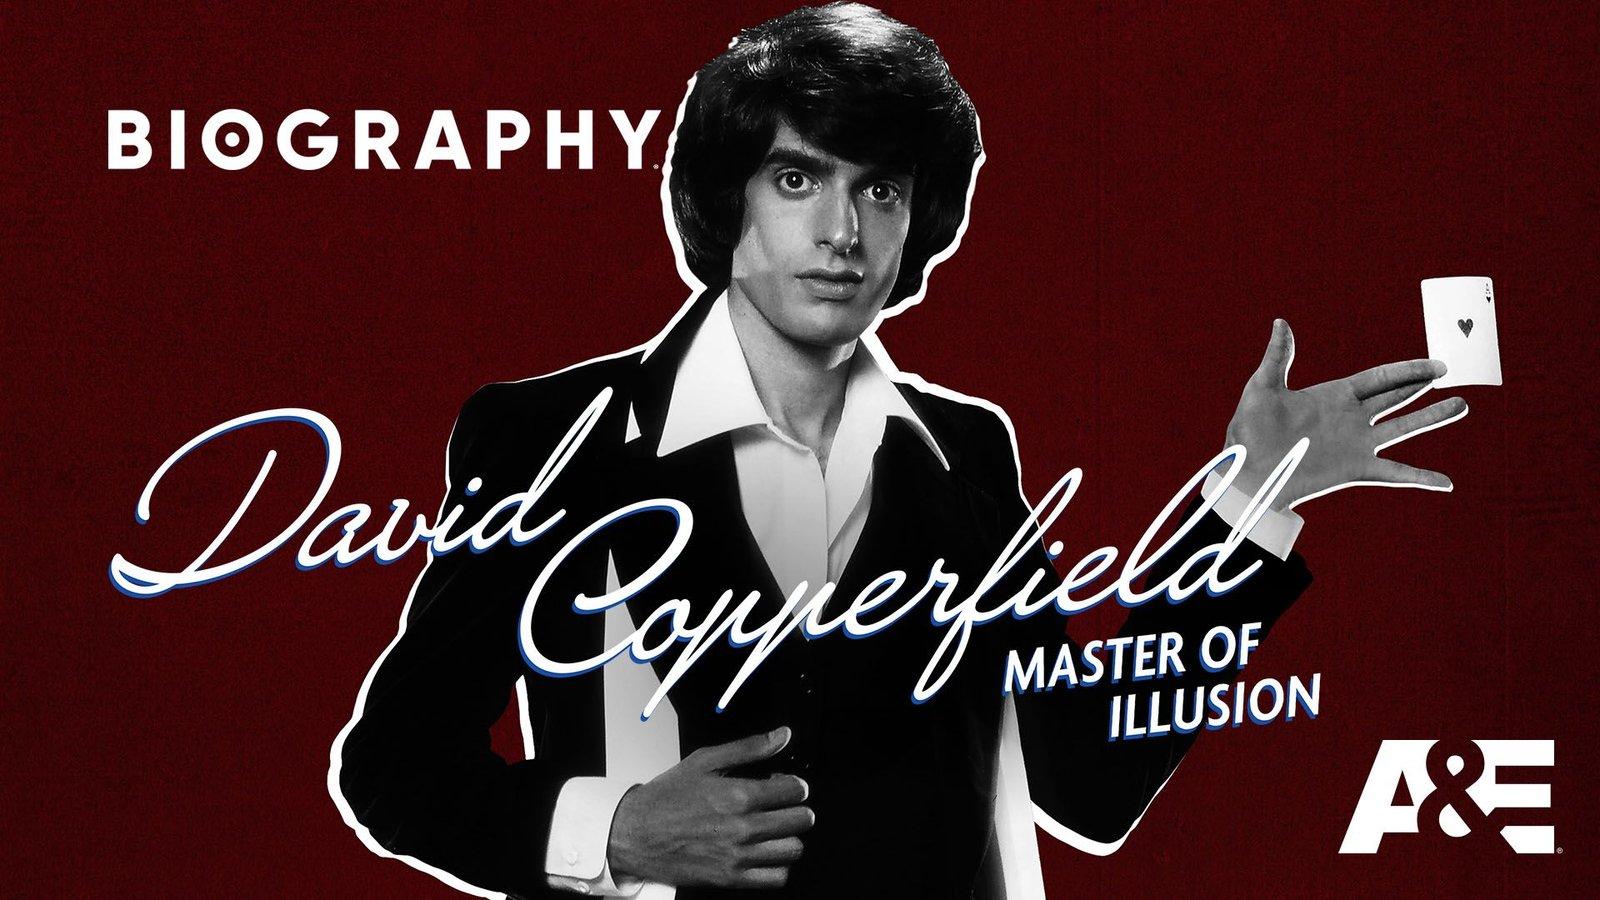 David Copperfield: Master of Illusion